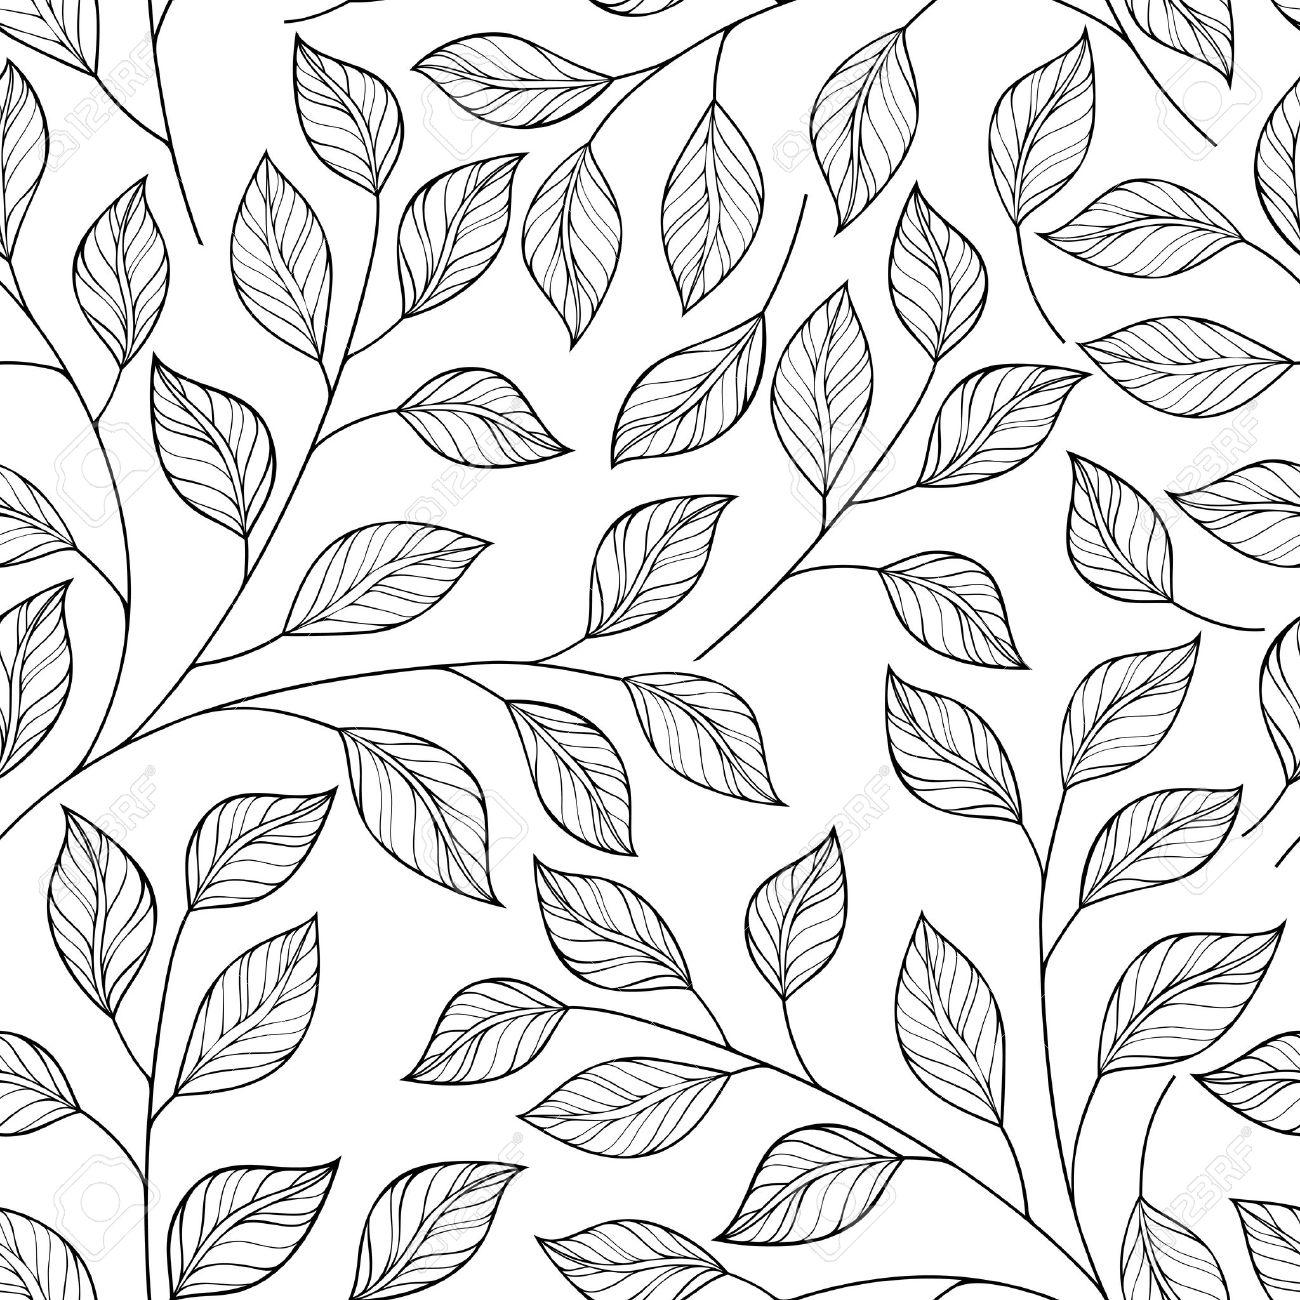 1300x1300 Vector Seamless Contour Floral Pattern. Hand Drawn Monochrome